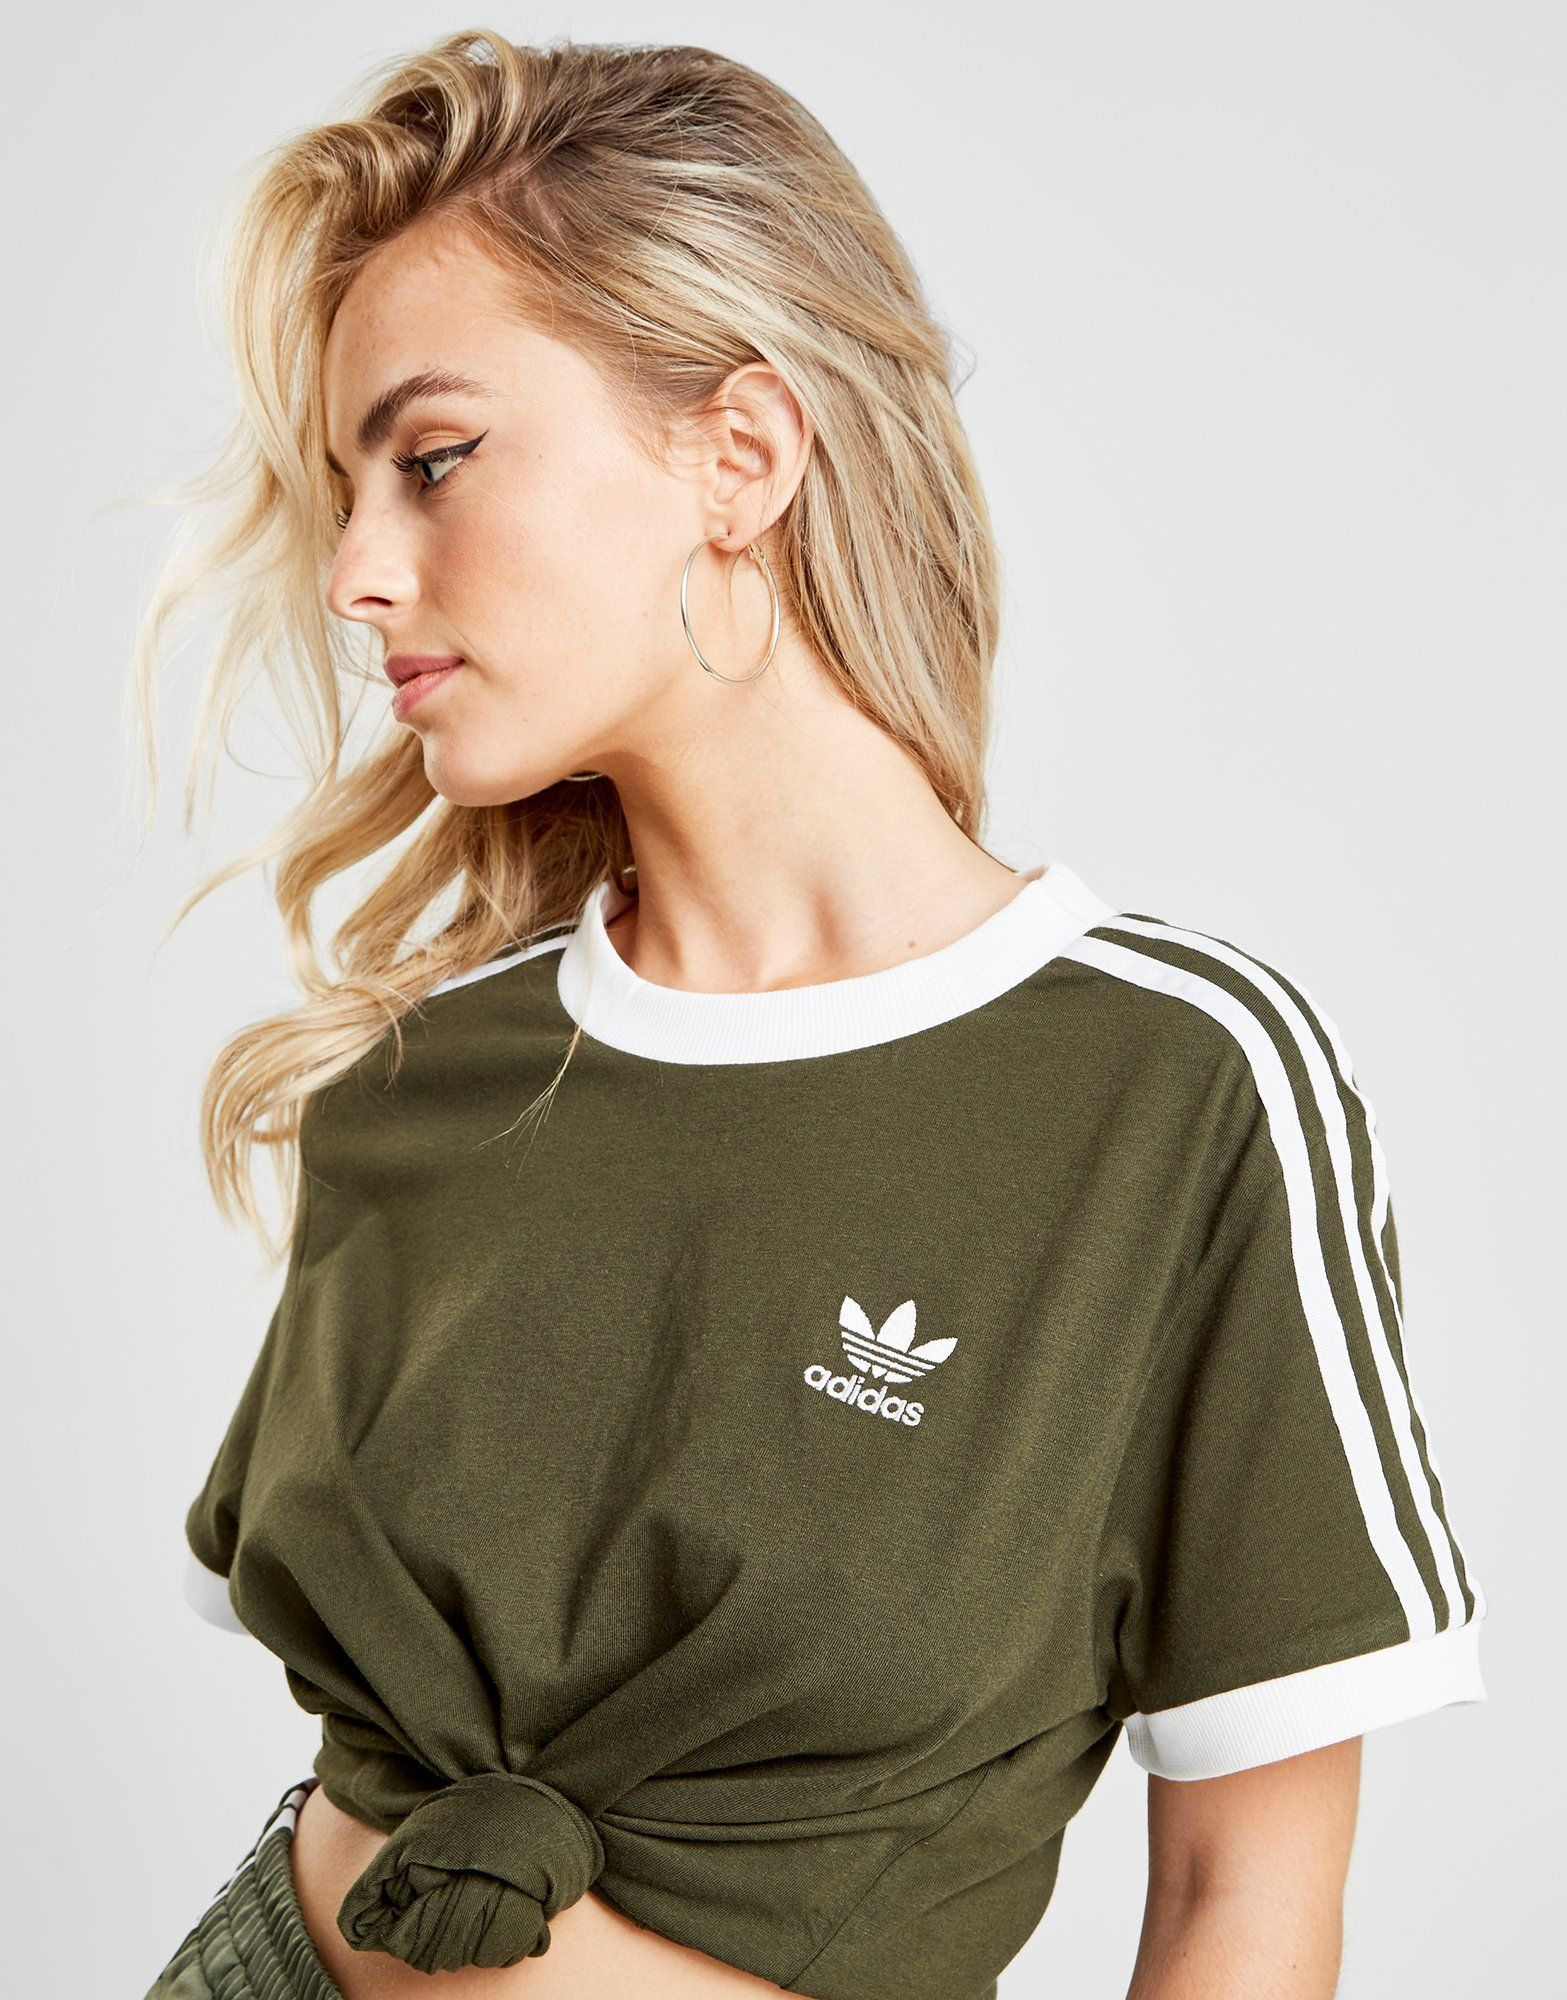 adidas Originals 3 Stripes California T Shirt Dames Shop